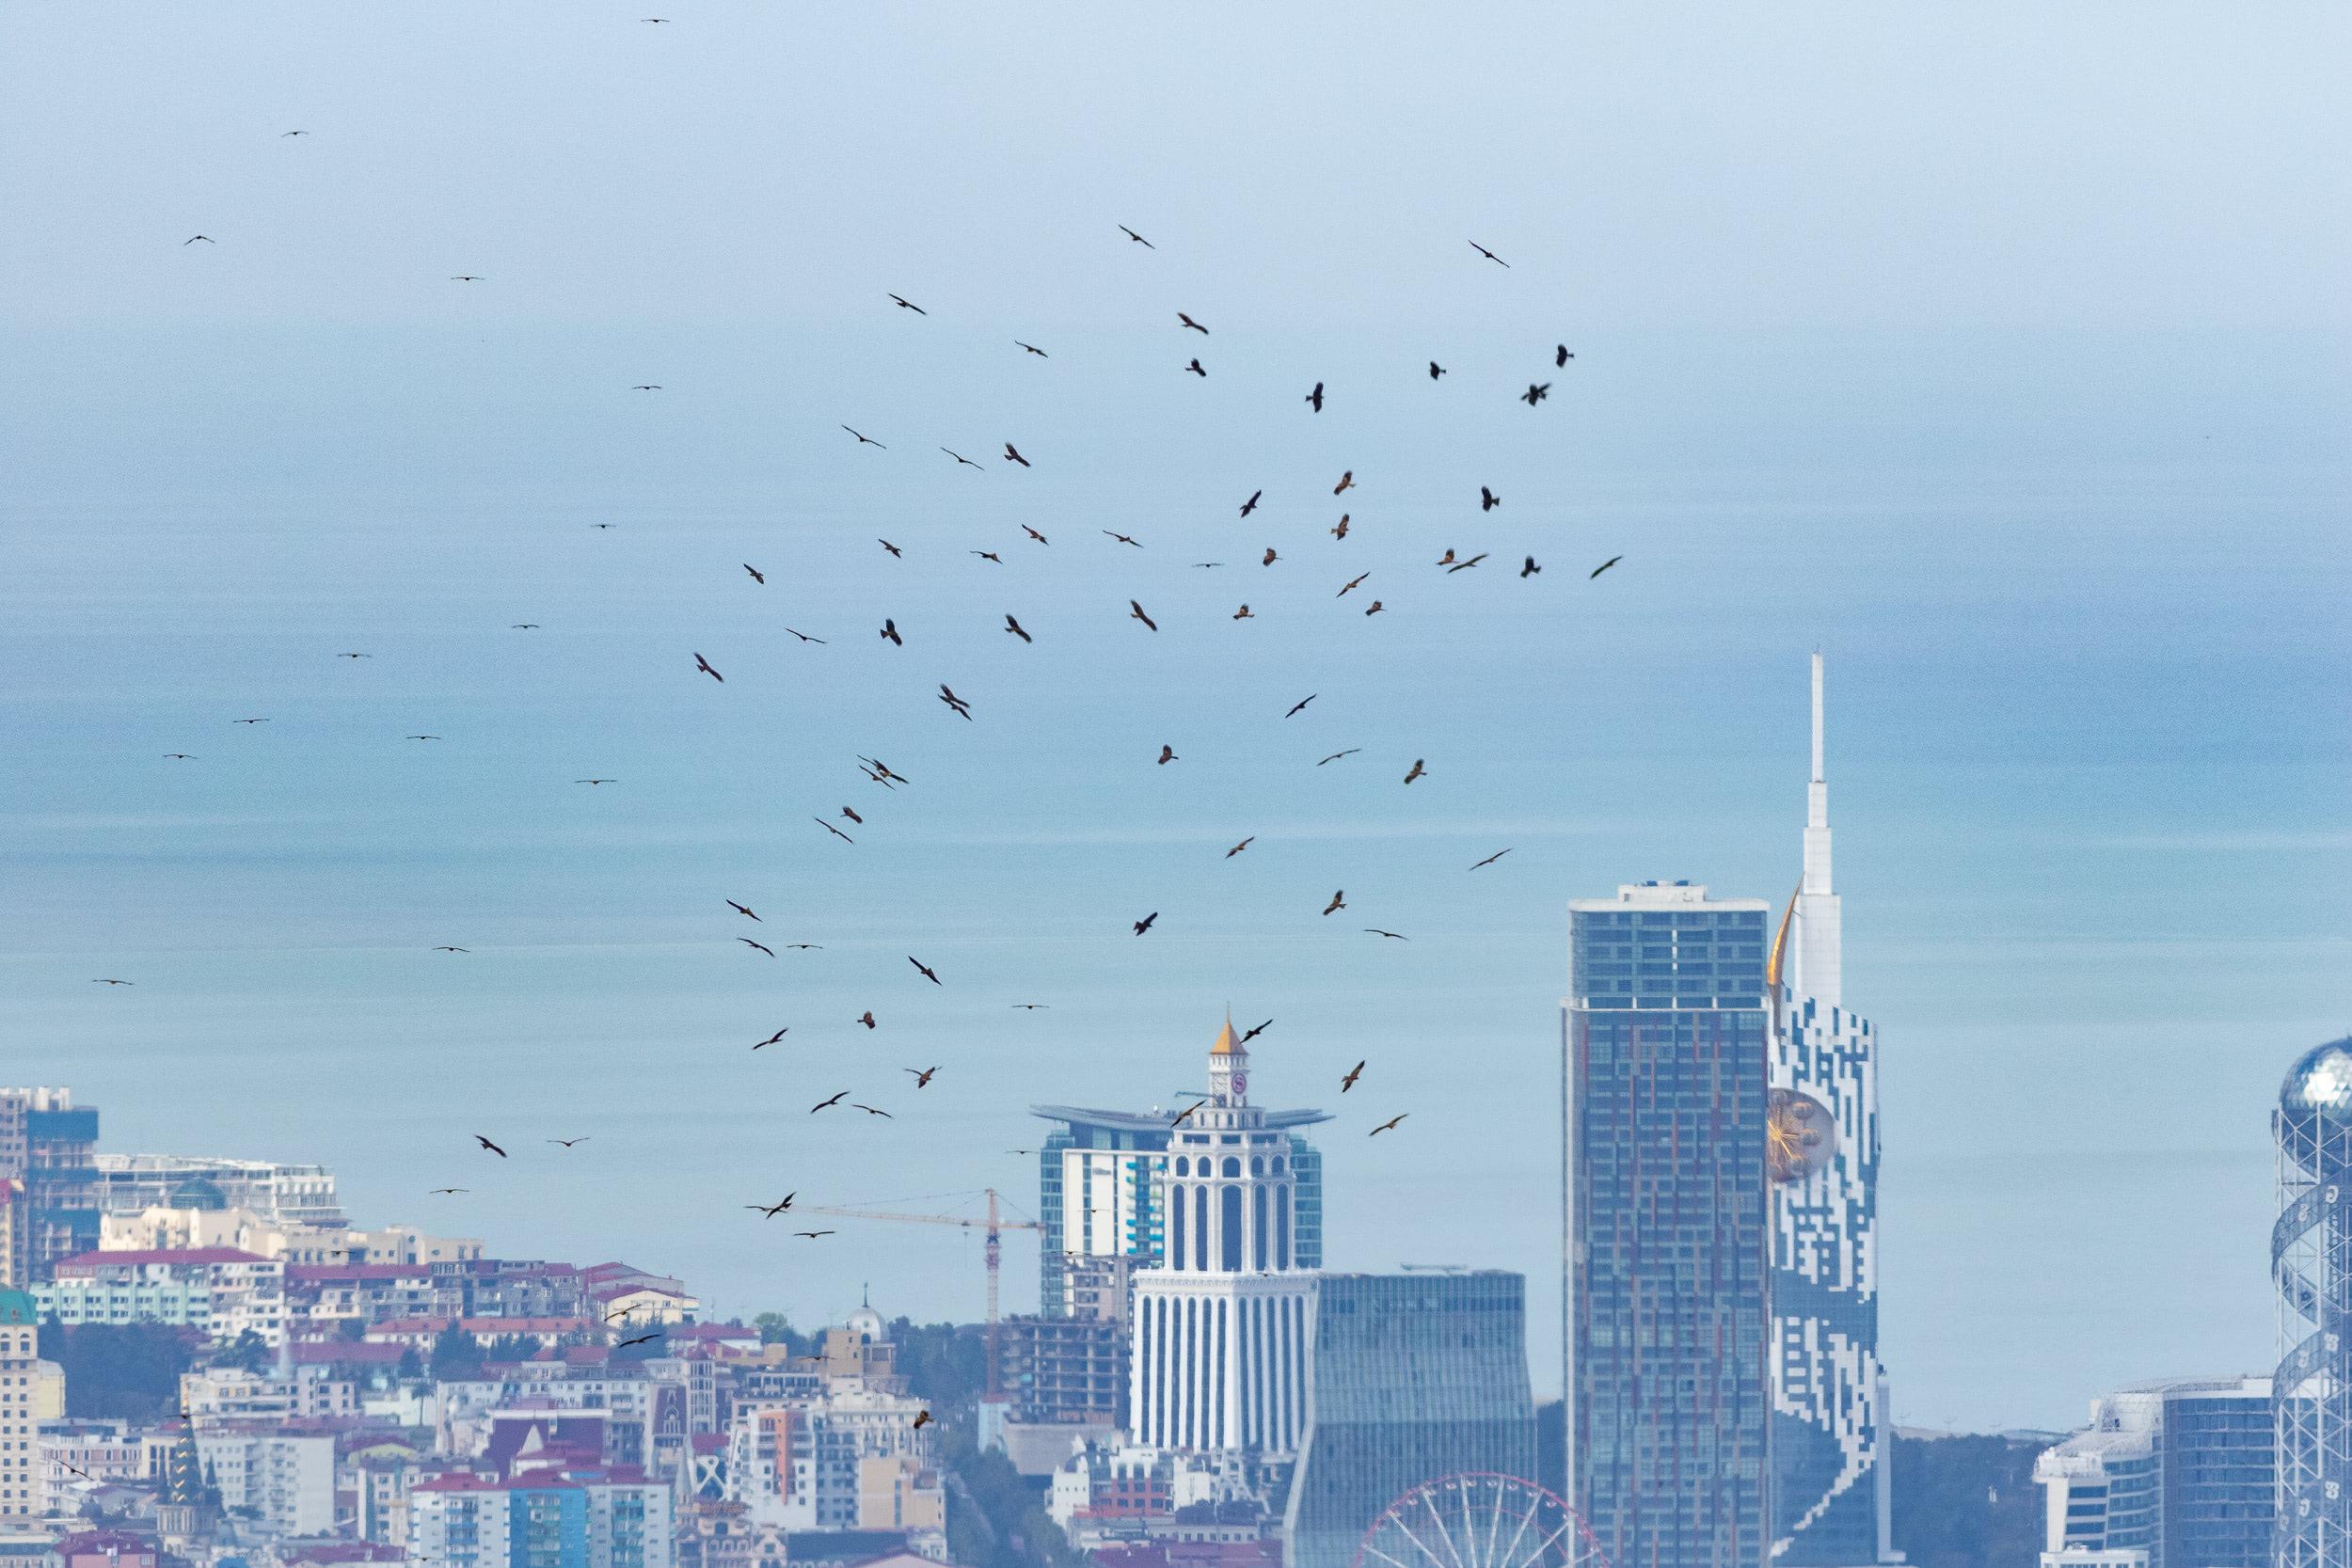 Black Kites in front of the Batumi skyline. Photo by Diego Jansen.